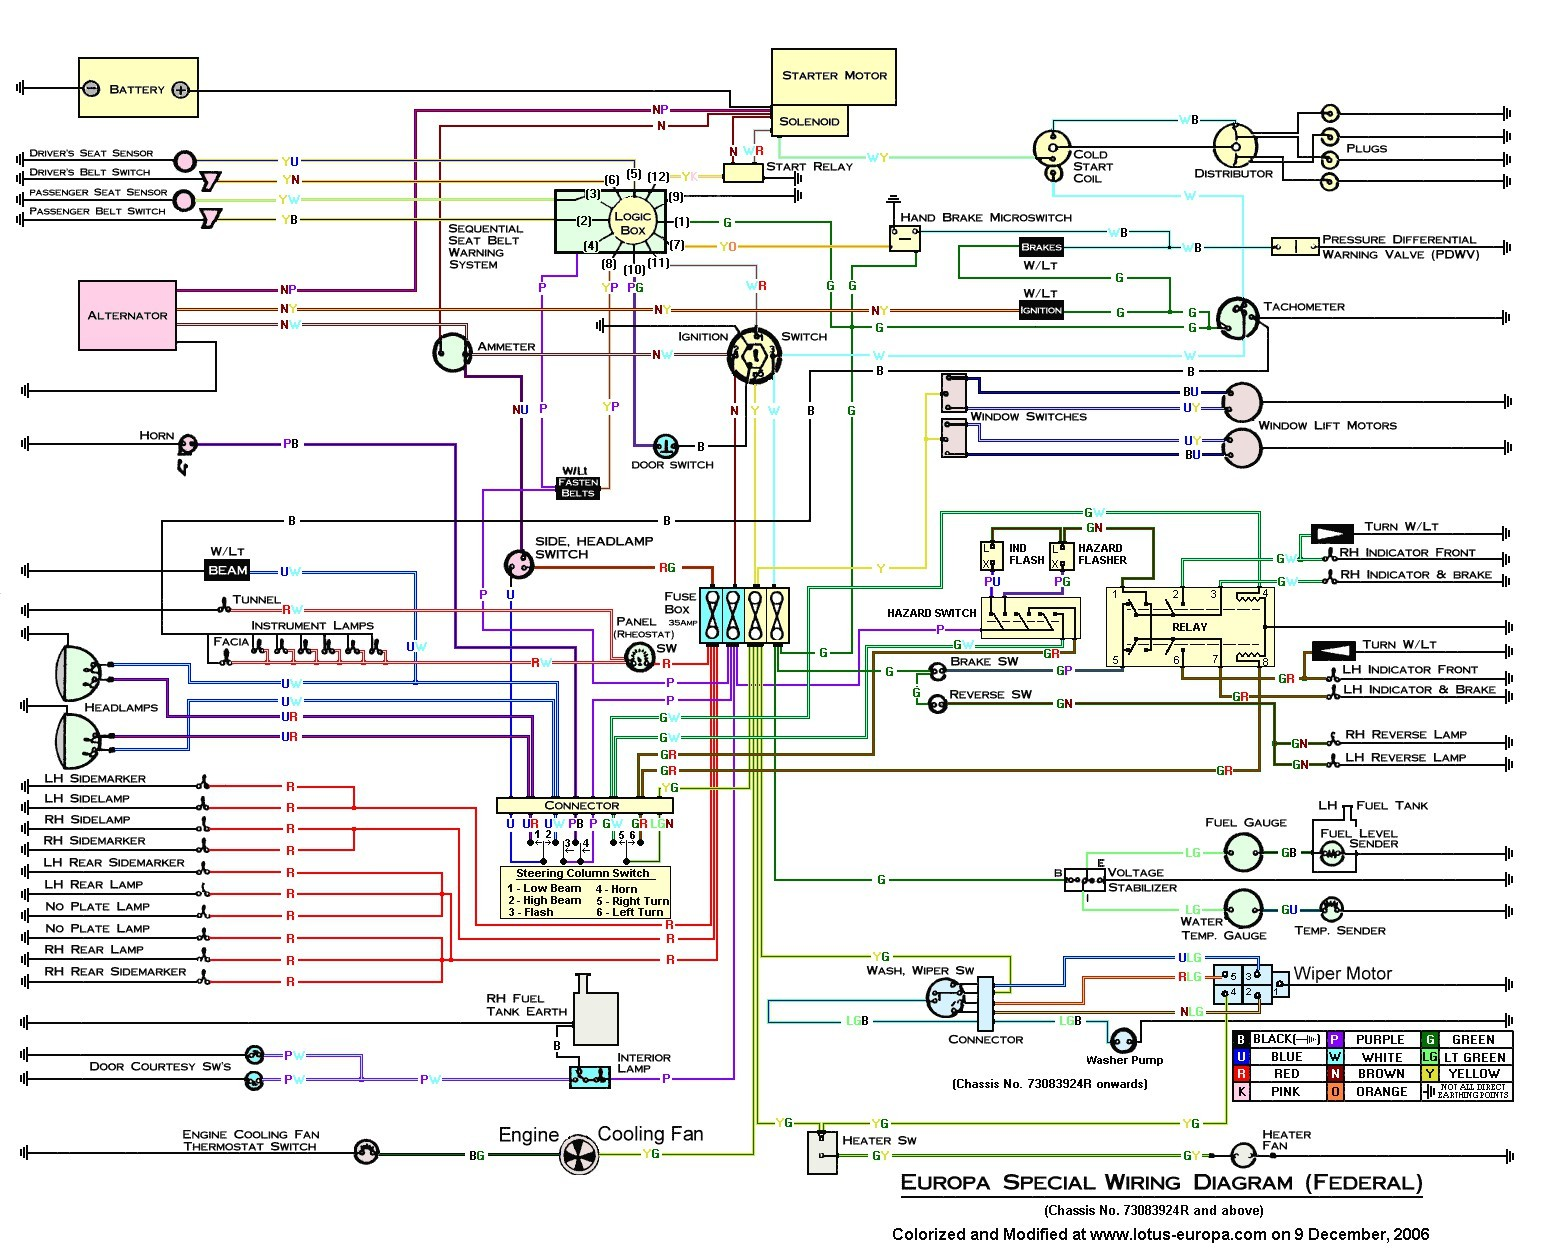 Jvc car radio stereo audio wiring diagram